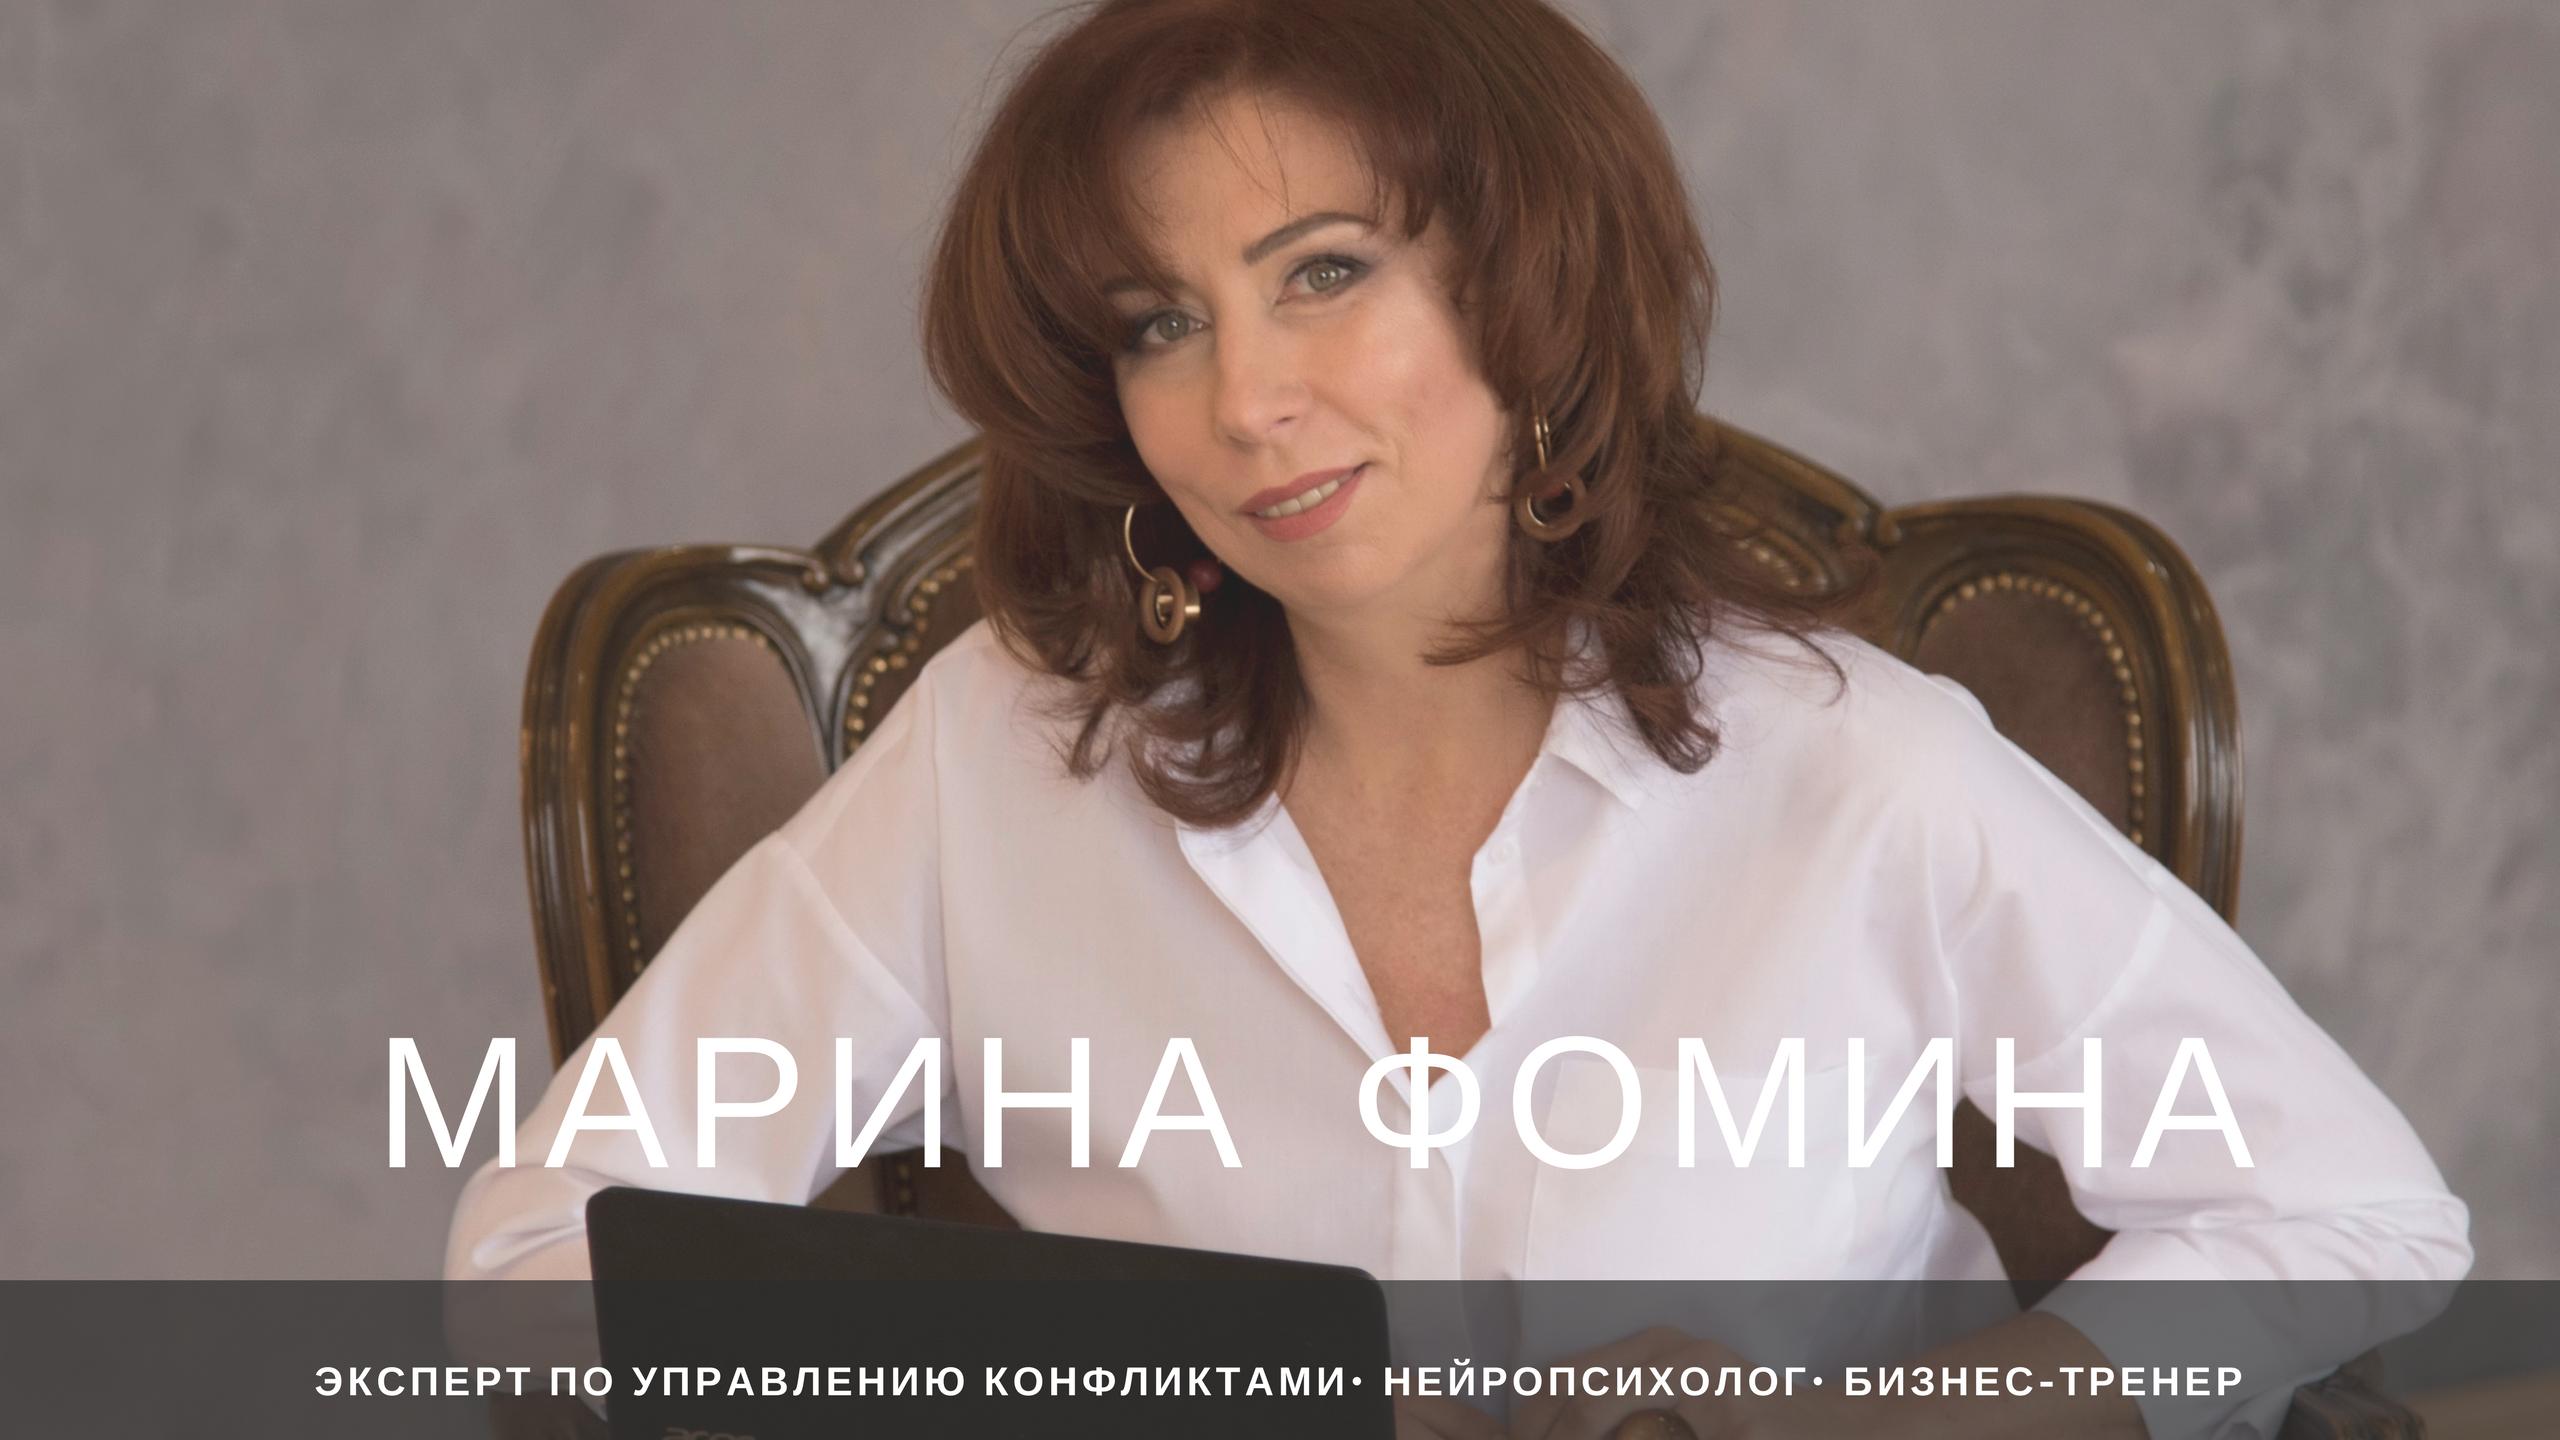 Марина Фомина конфликтолог